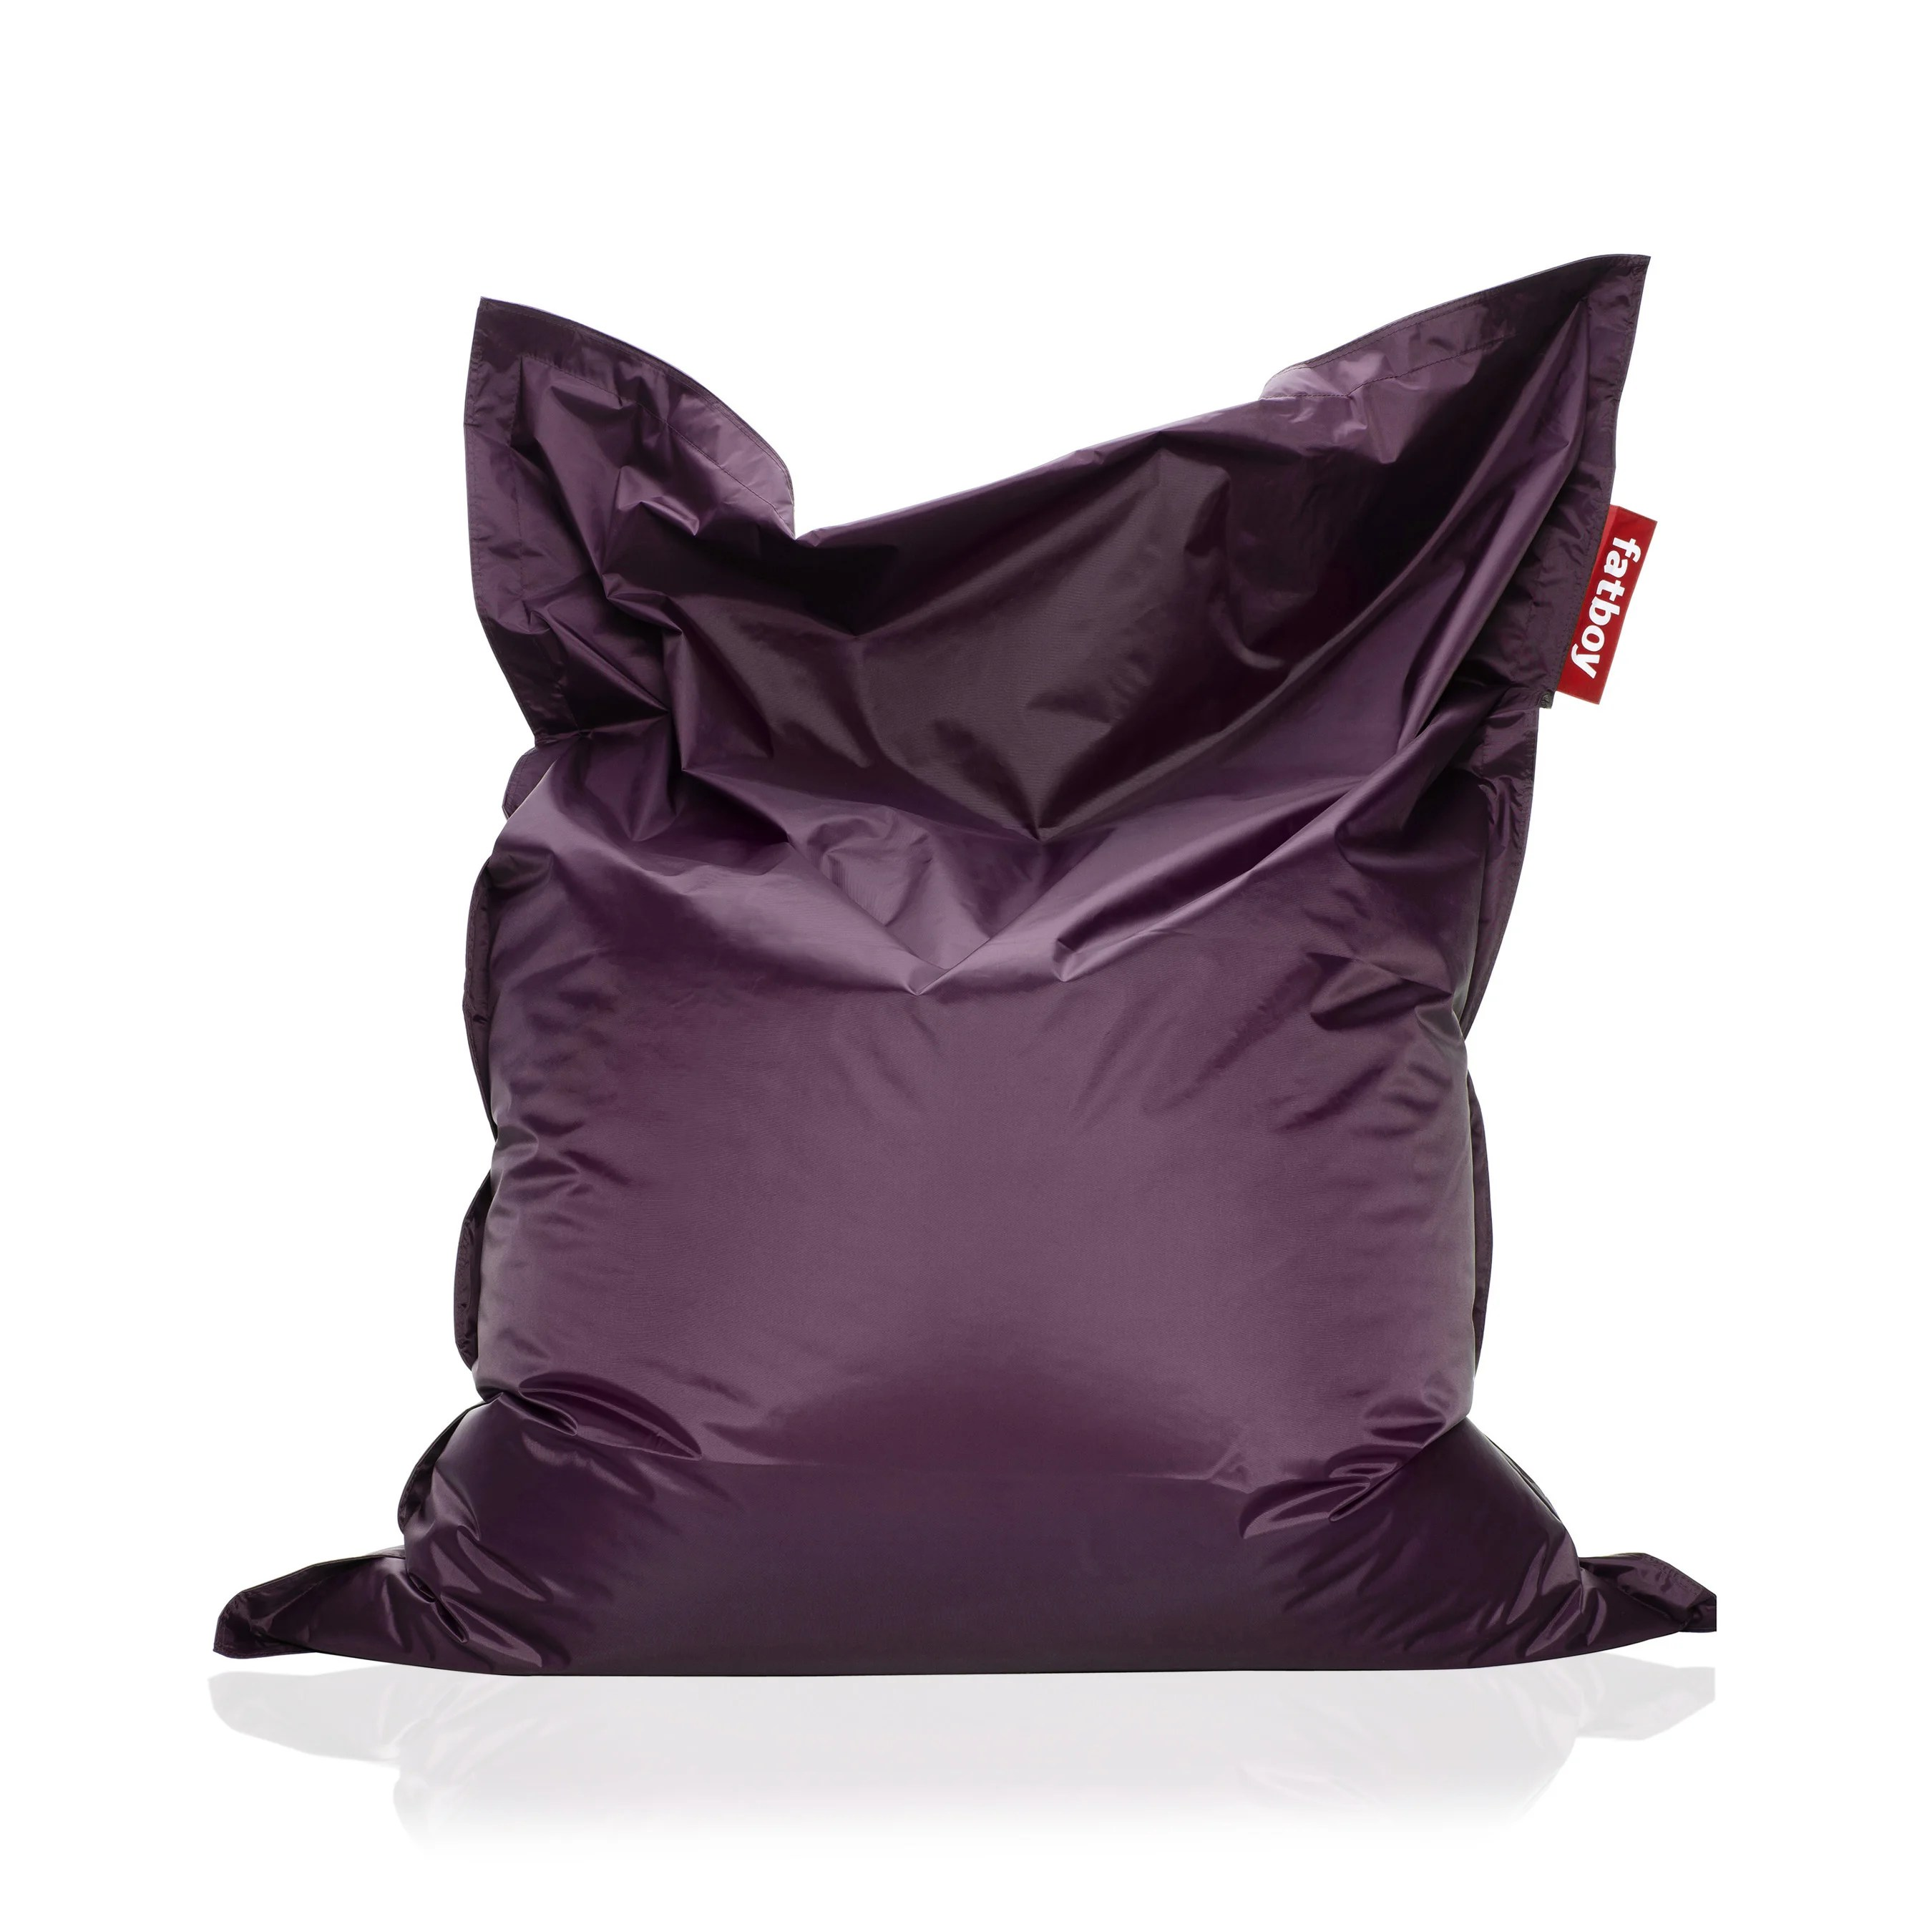 bean bags chair nursery recliner original bag reviews allmodern